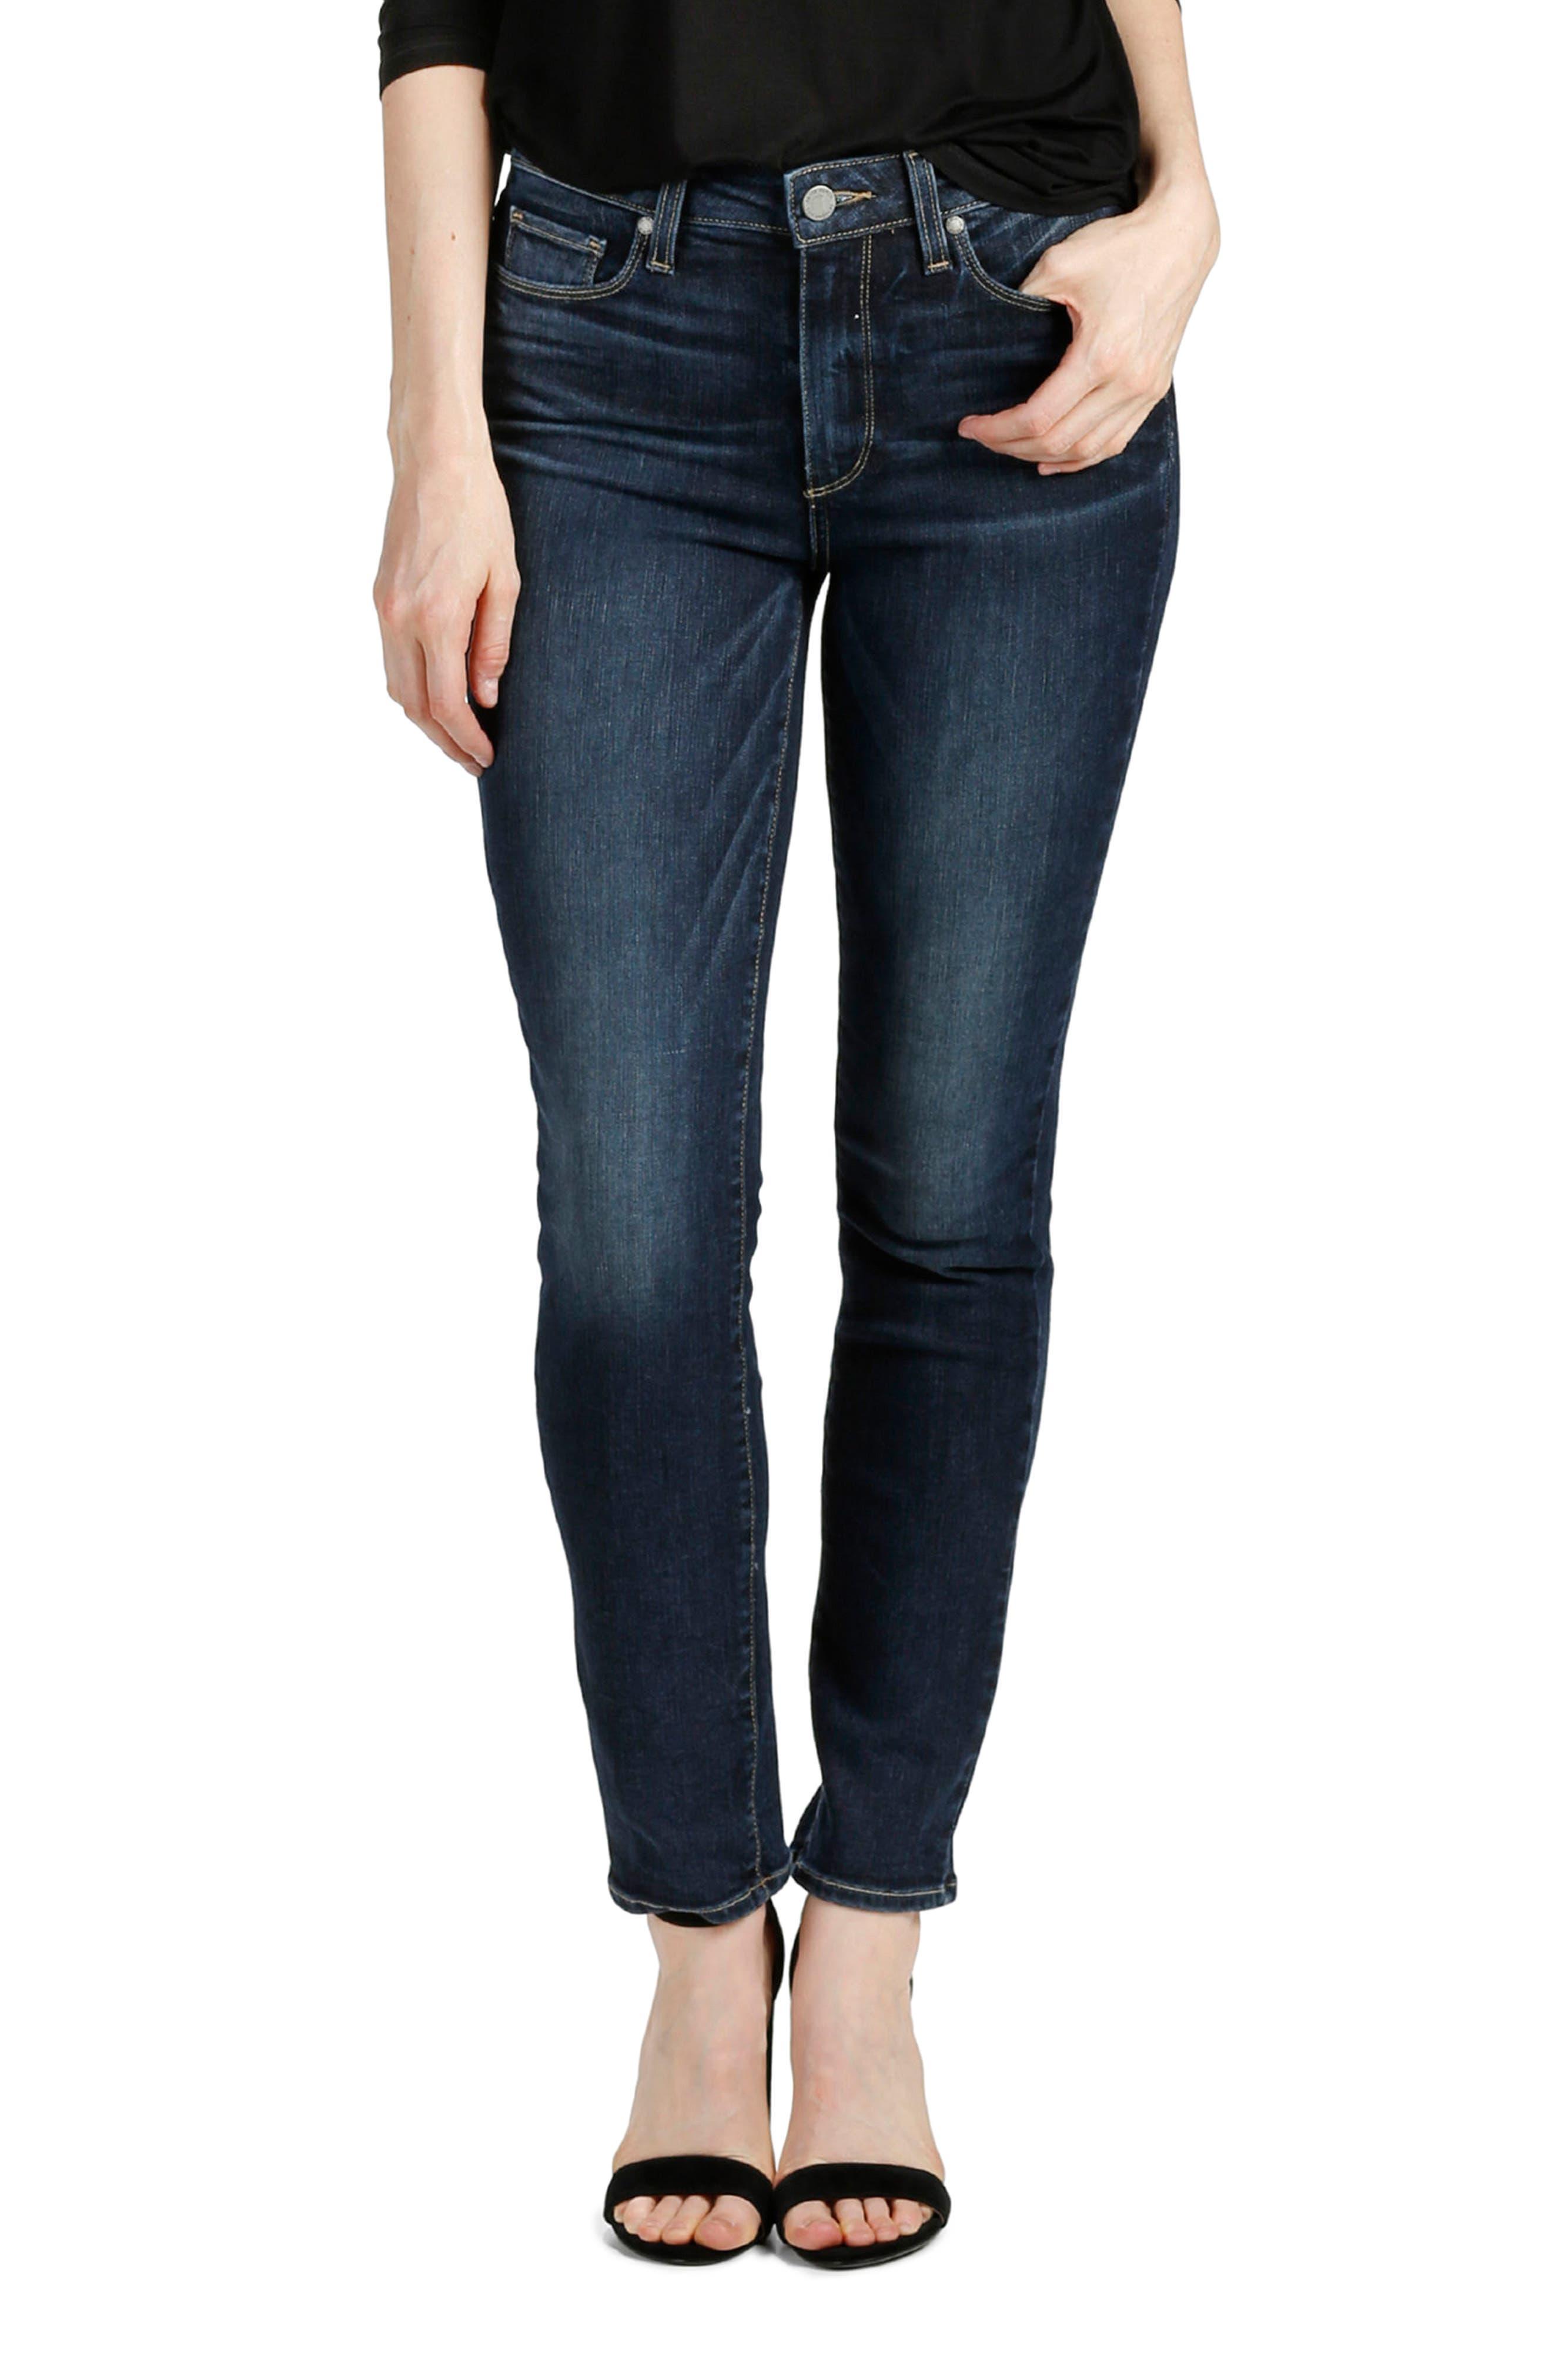 Main Image - PAIGE Transcend Vintage - Hoxton Ankle Peg Skinny Jeans (Jerry Girl)